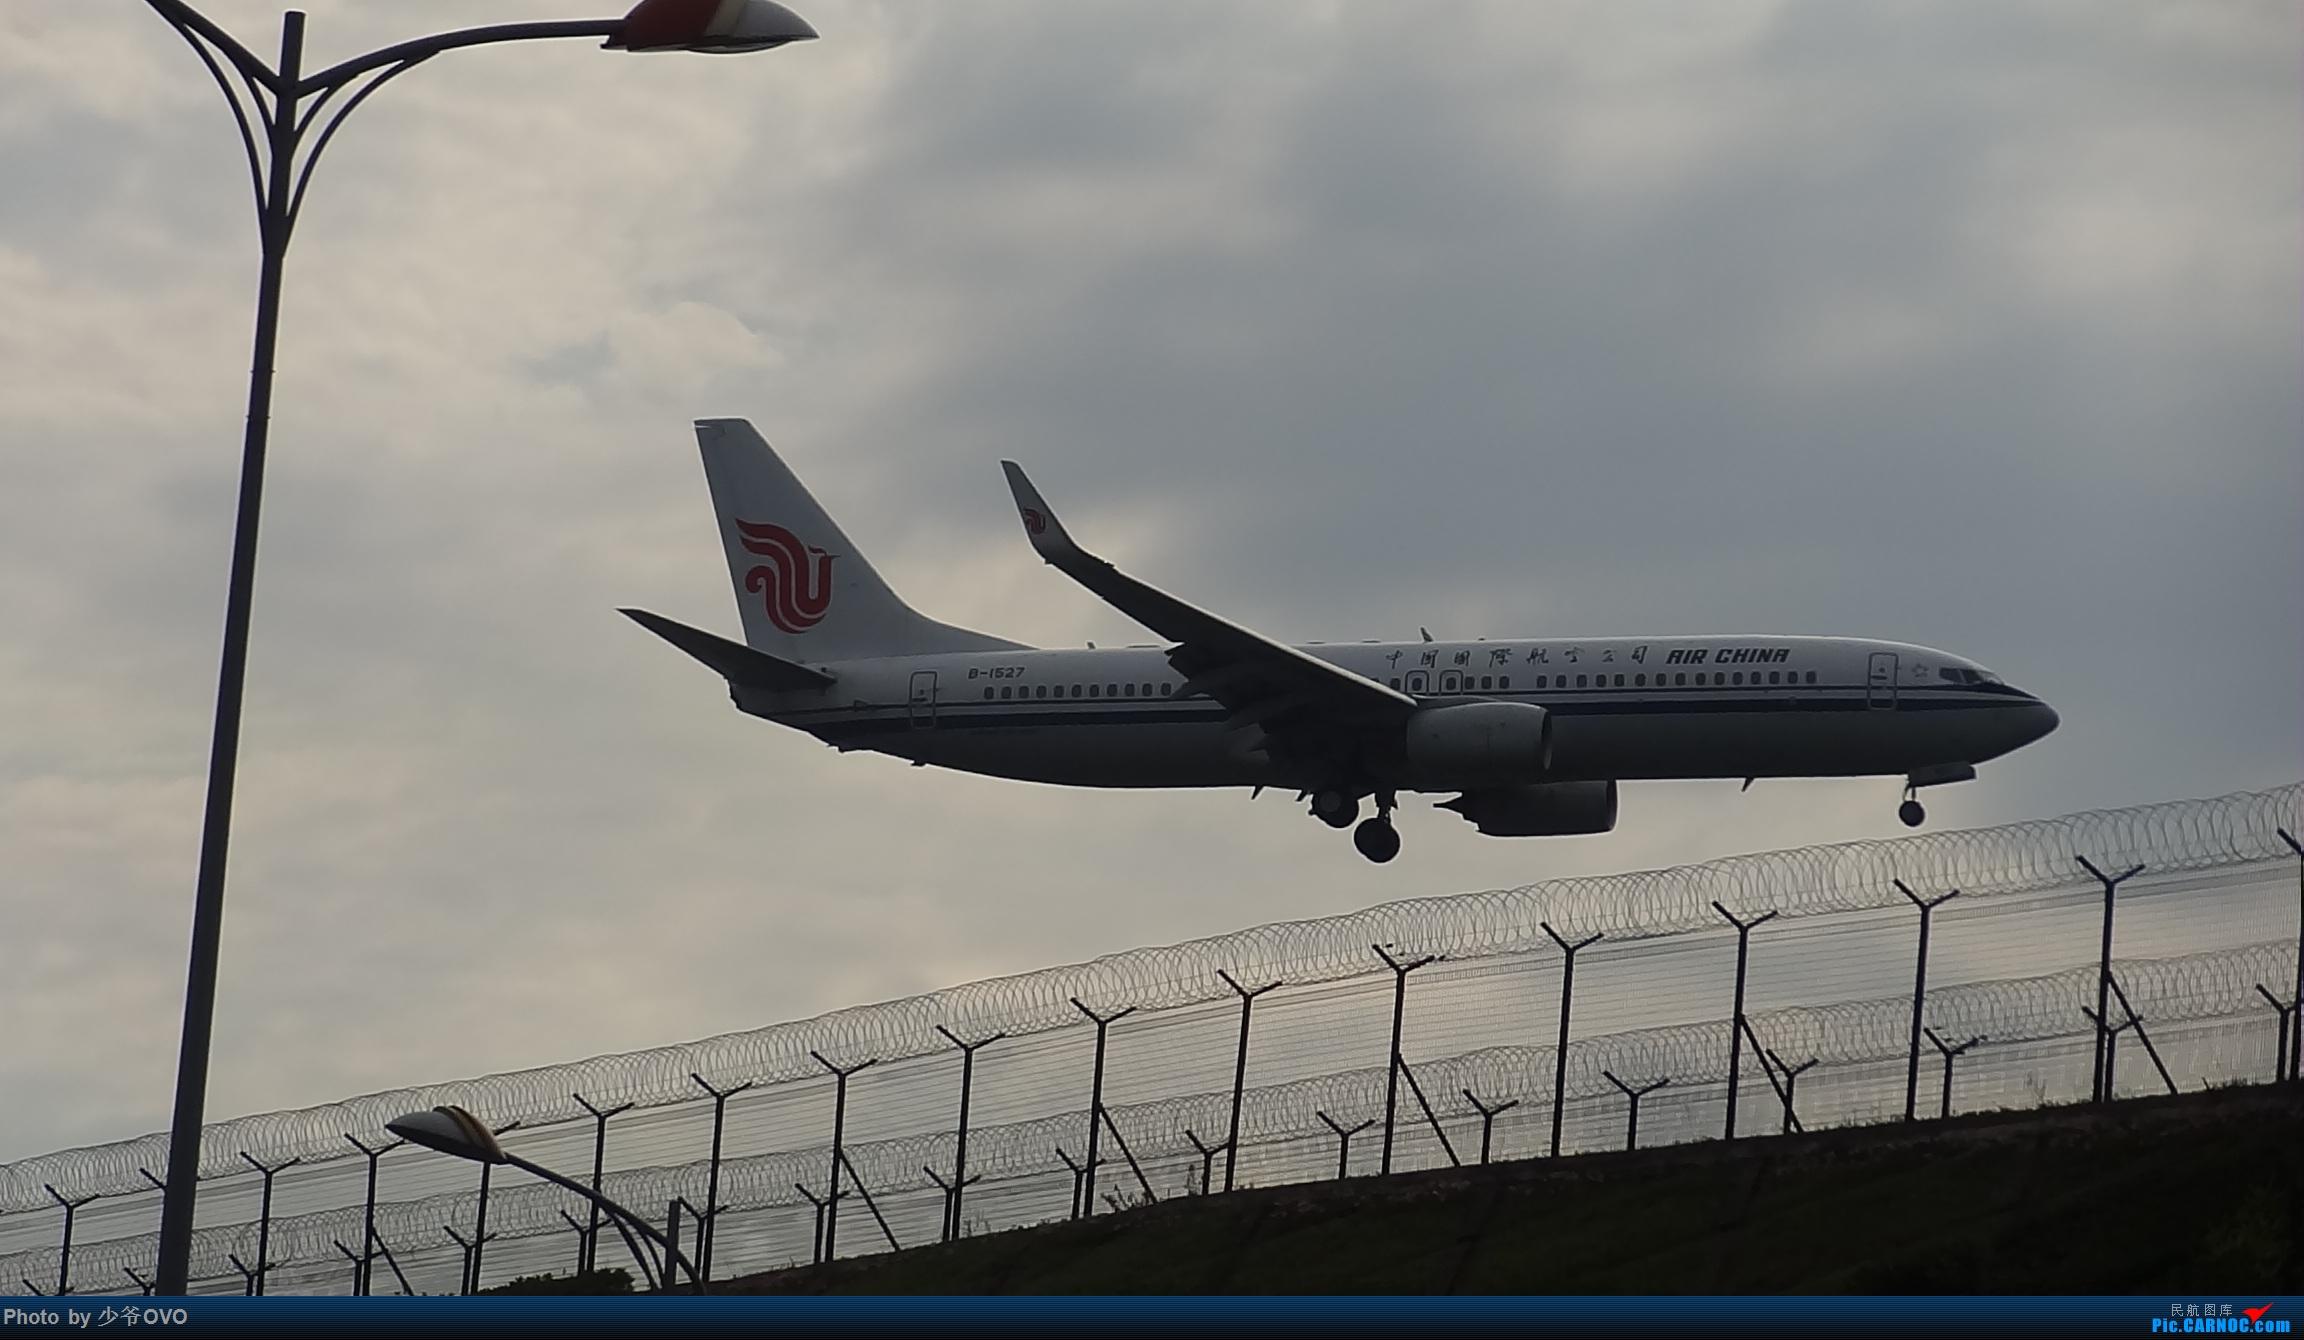 Re:[原创]CKG拍机,数码机最后的倔强 BOEING 737-800 B-1527 中国重庆江北国际机场